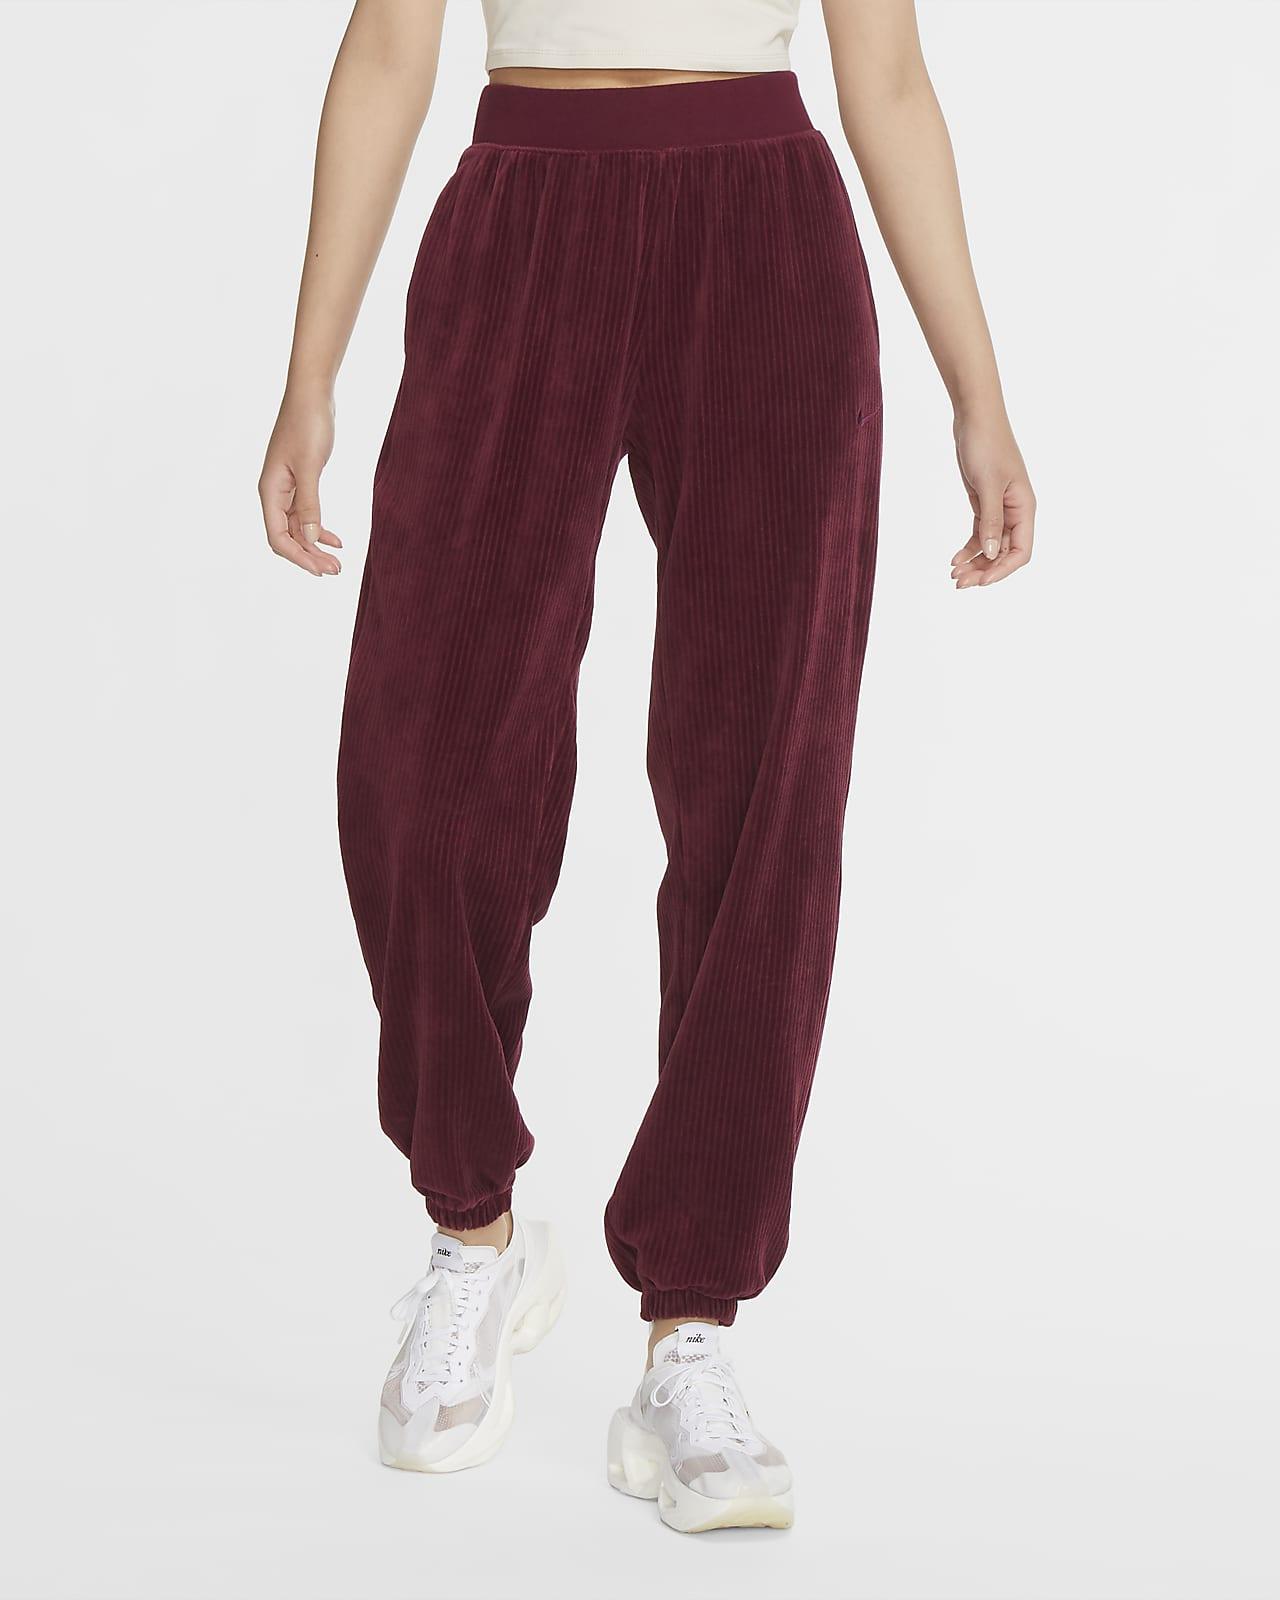 Pantalones de velour para mujer Nike Sportswear